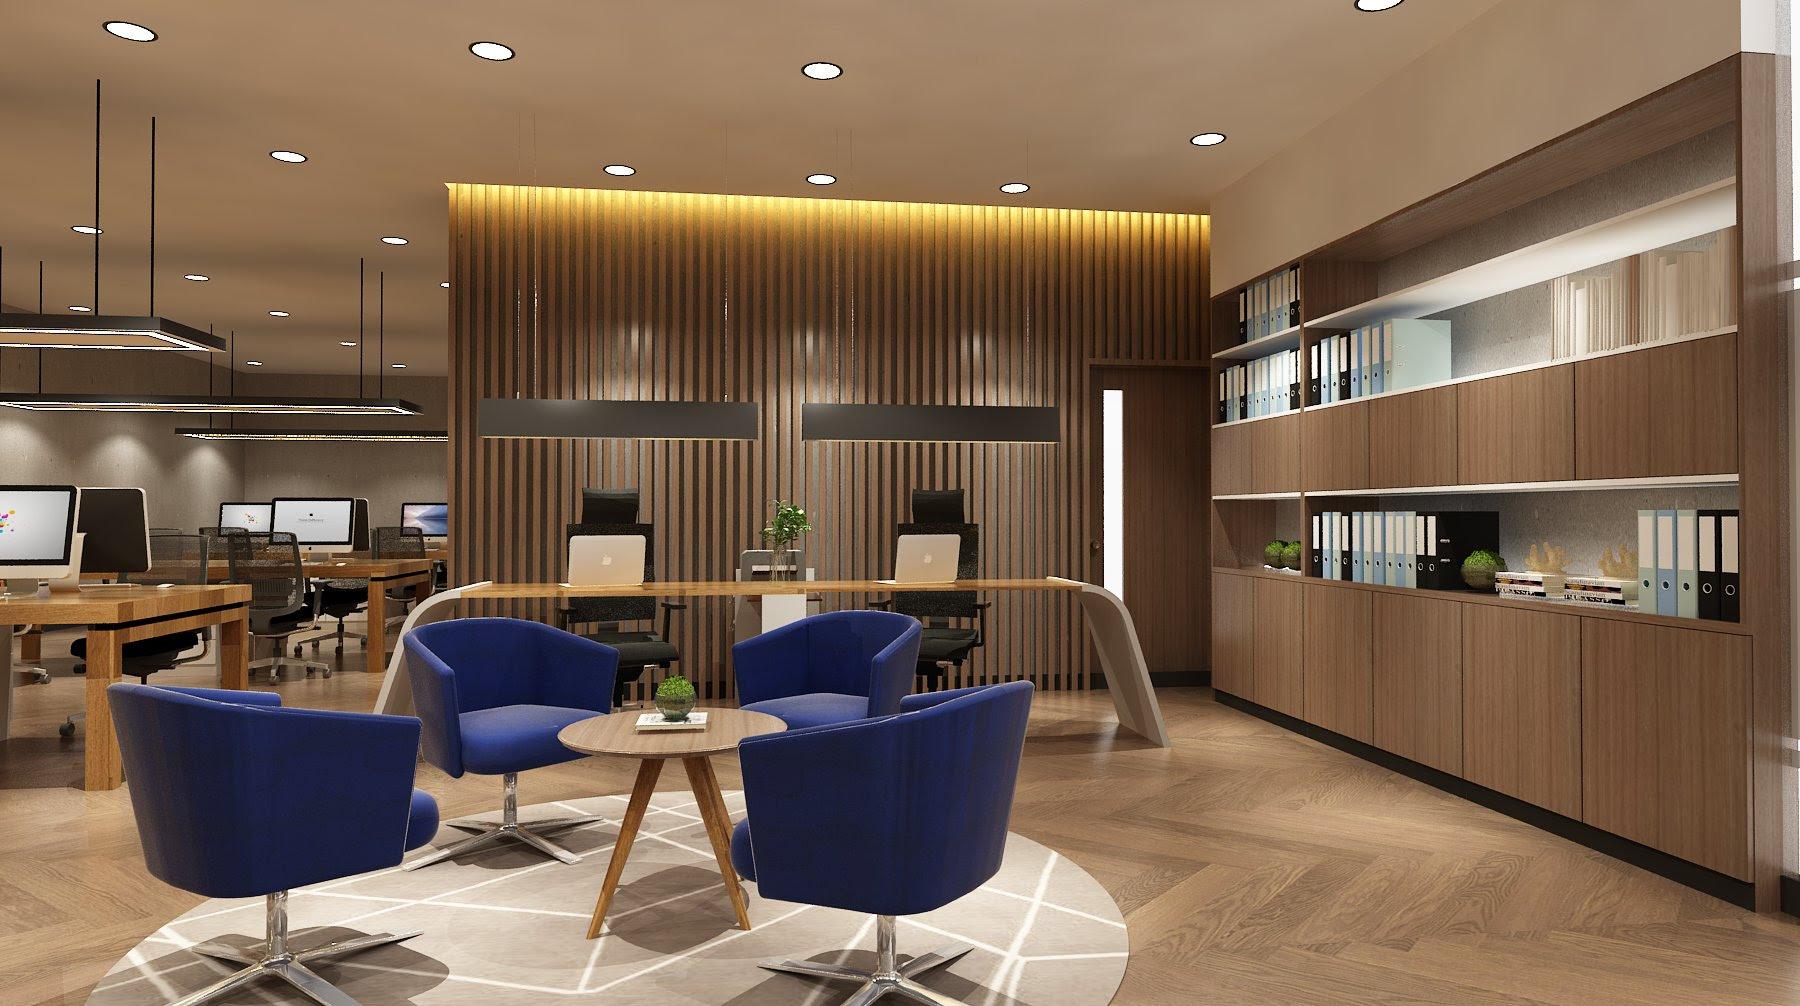 Home Tfq Arsitek Jasa Desain Rumah Kantor Balikpapan